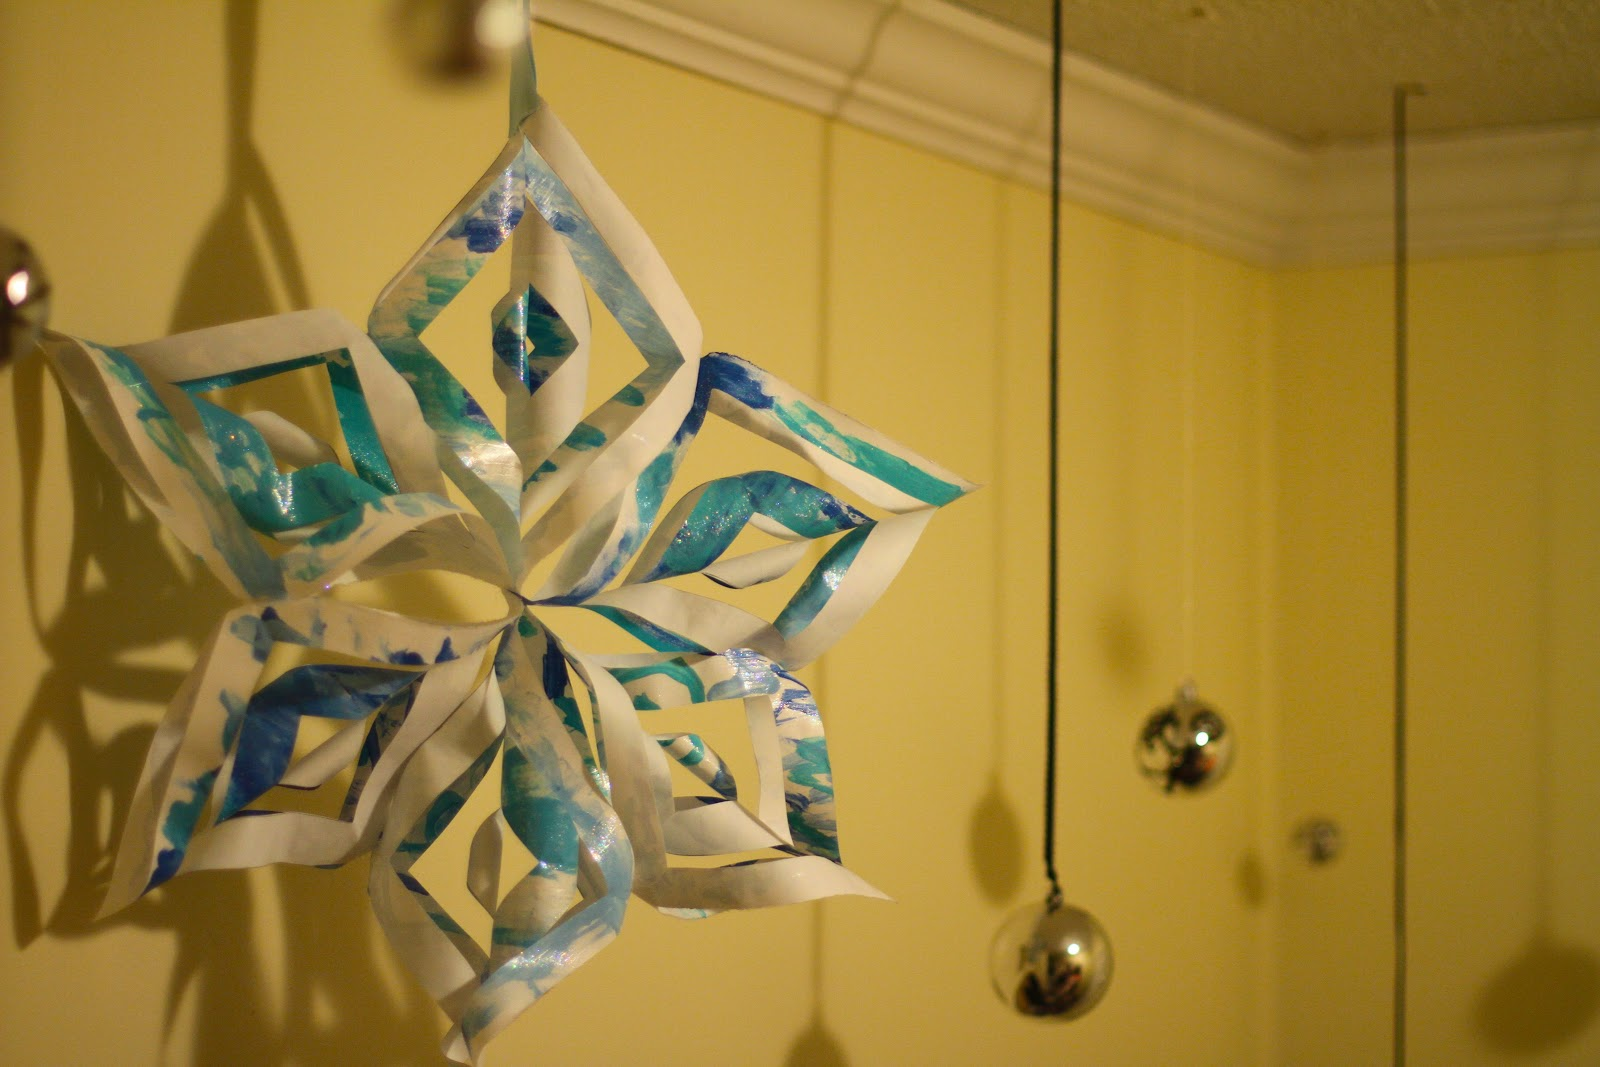 3d paper snowflakes gift wrap ideas